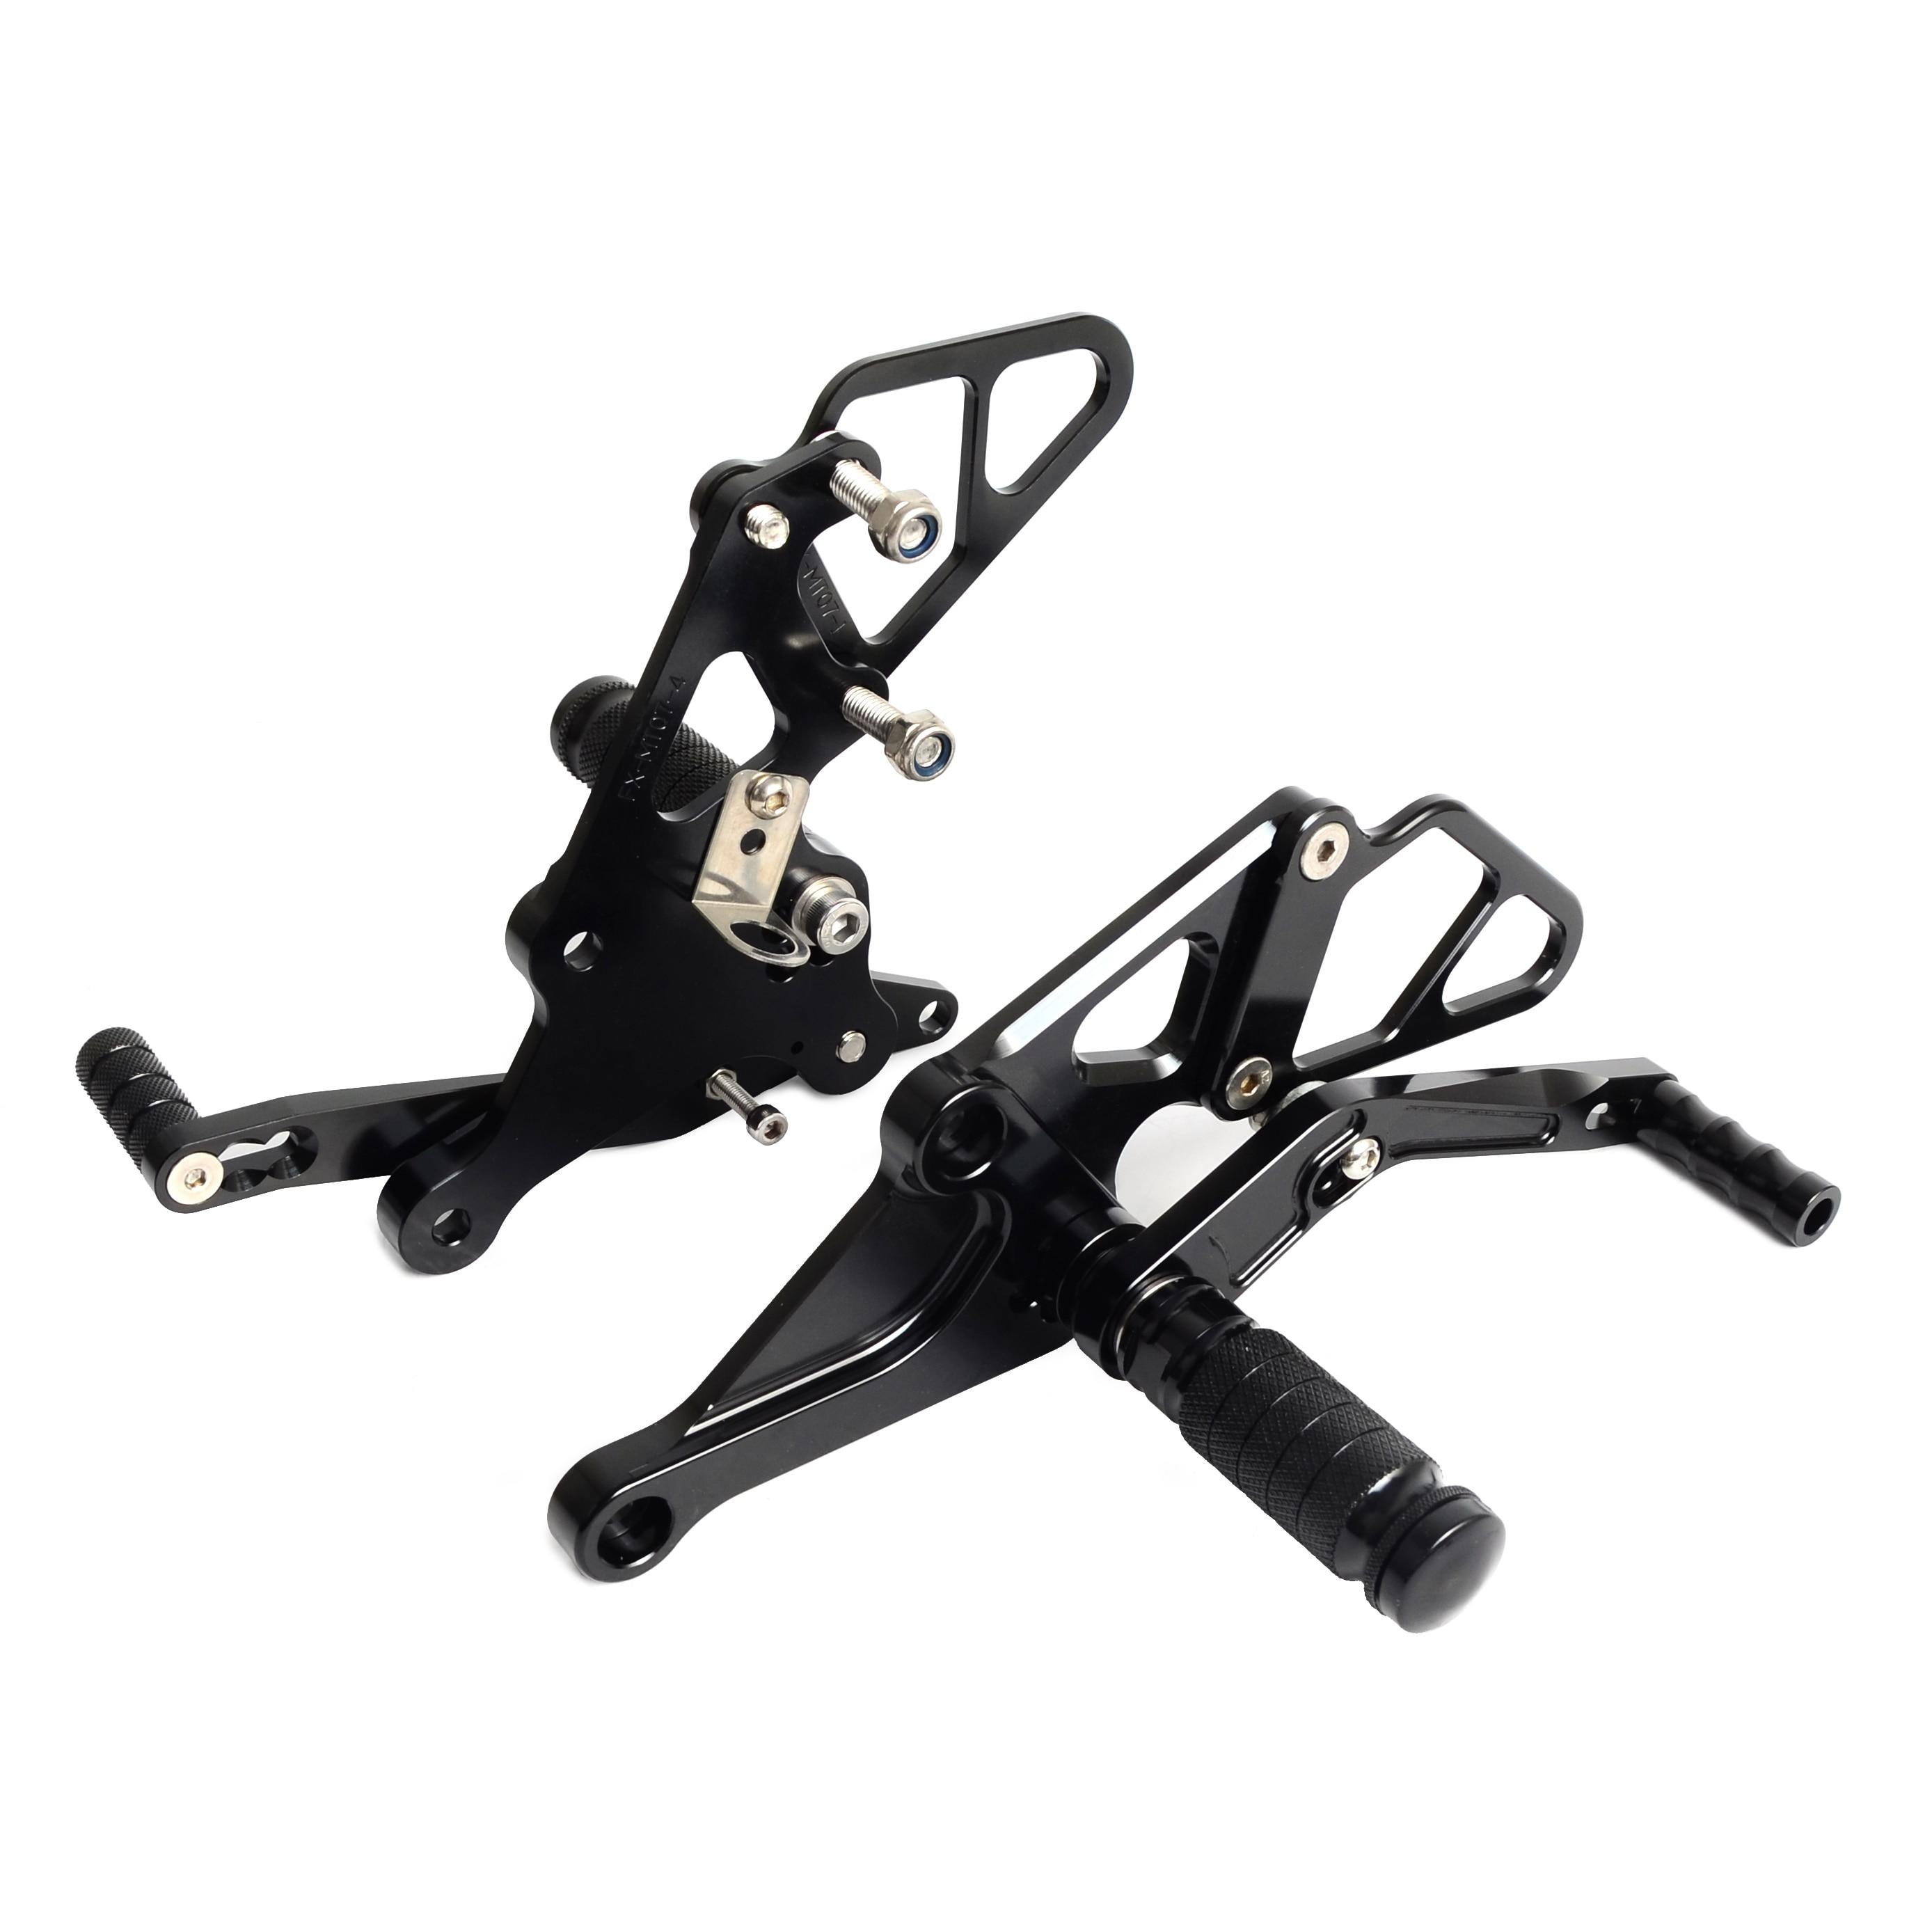 New CNC Billet Racing Adjustable Rearset Foot Pegs Rear Sets For Yamaha  MT-07 FZ-07 MT07 FZ07 2013 2014 2015 2016